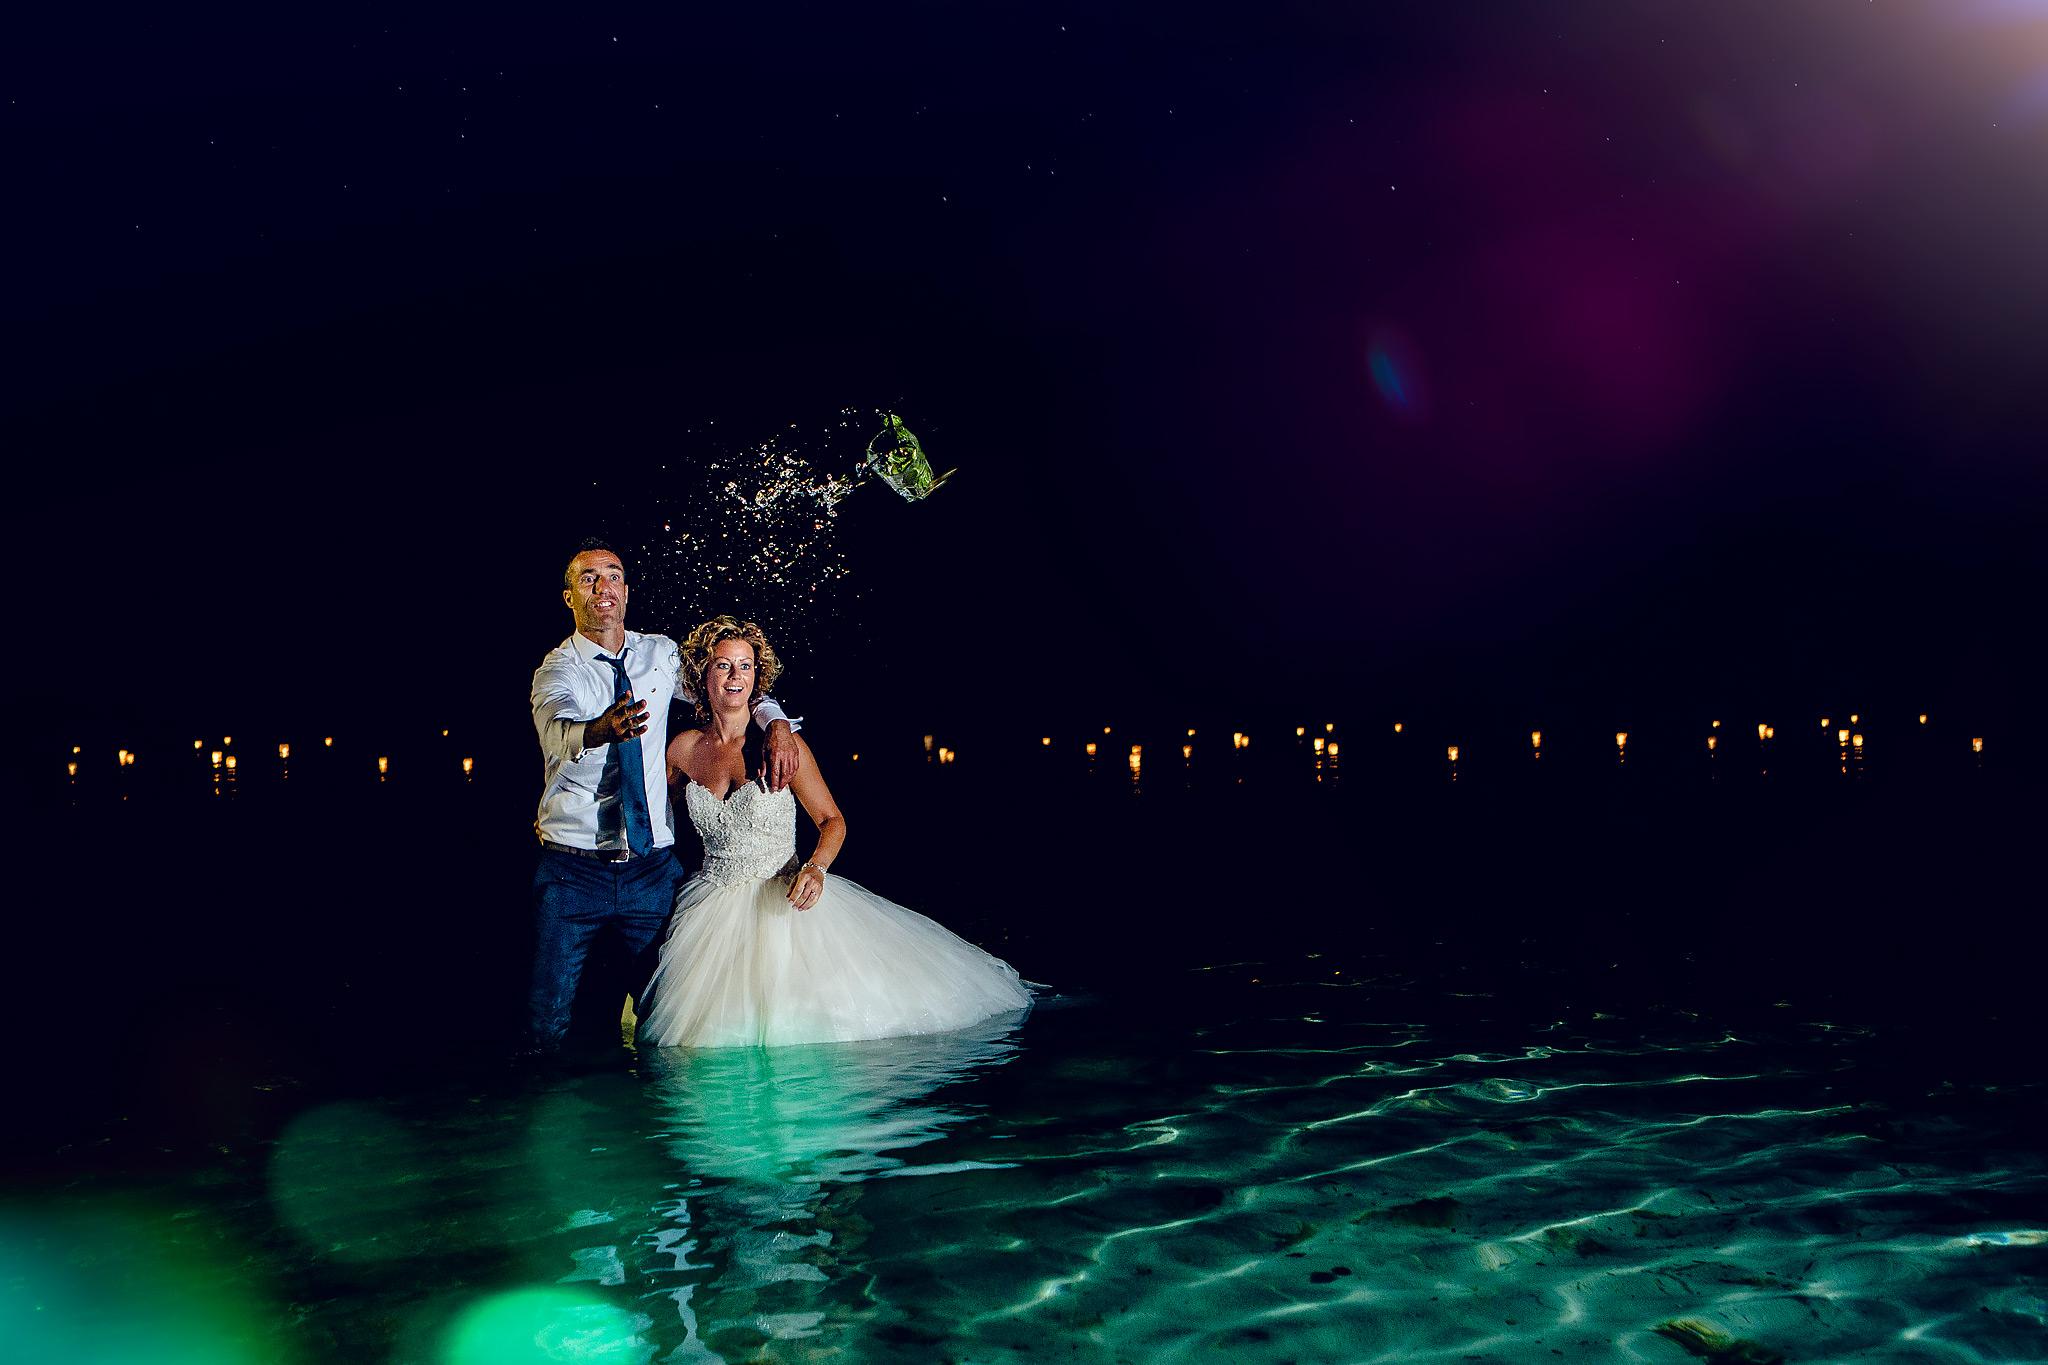 Bruidsreportage Destination Wedding Ibiza Mandy en Joost 025 - Bas Driessen Fotografie